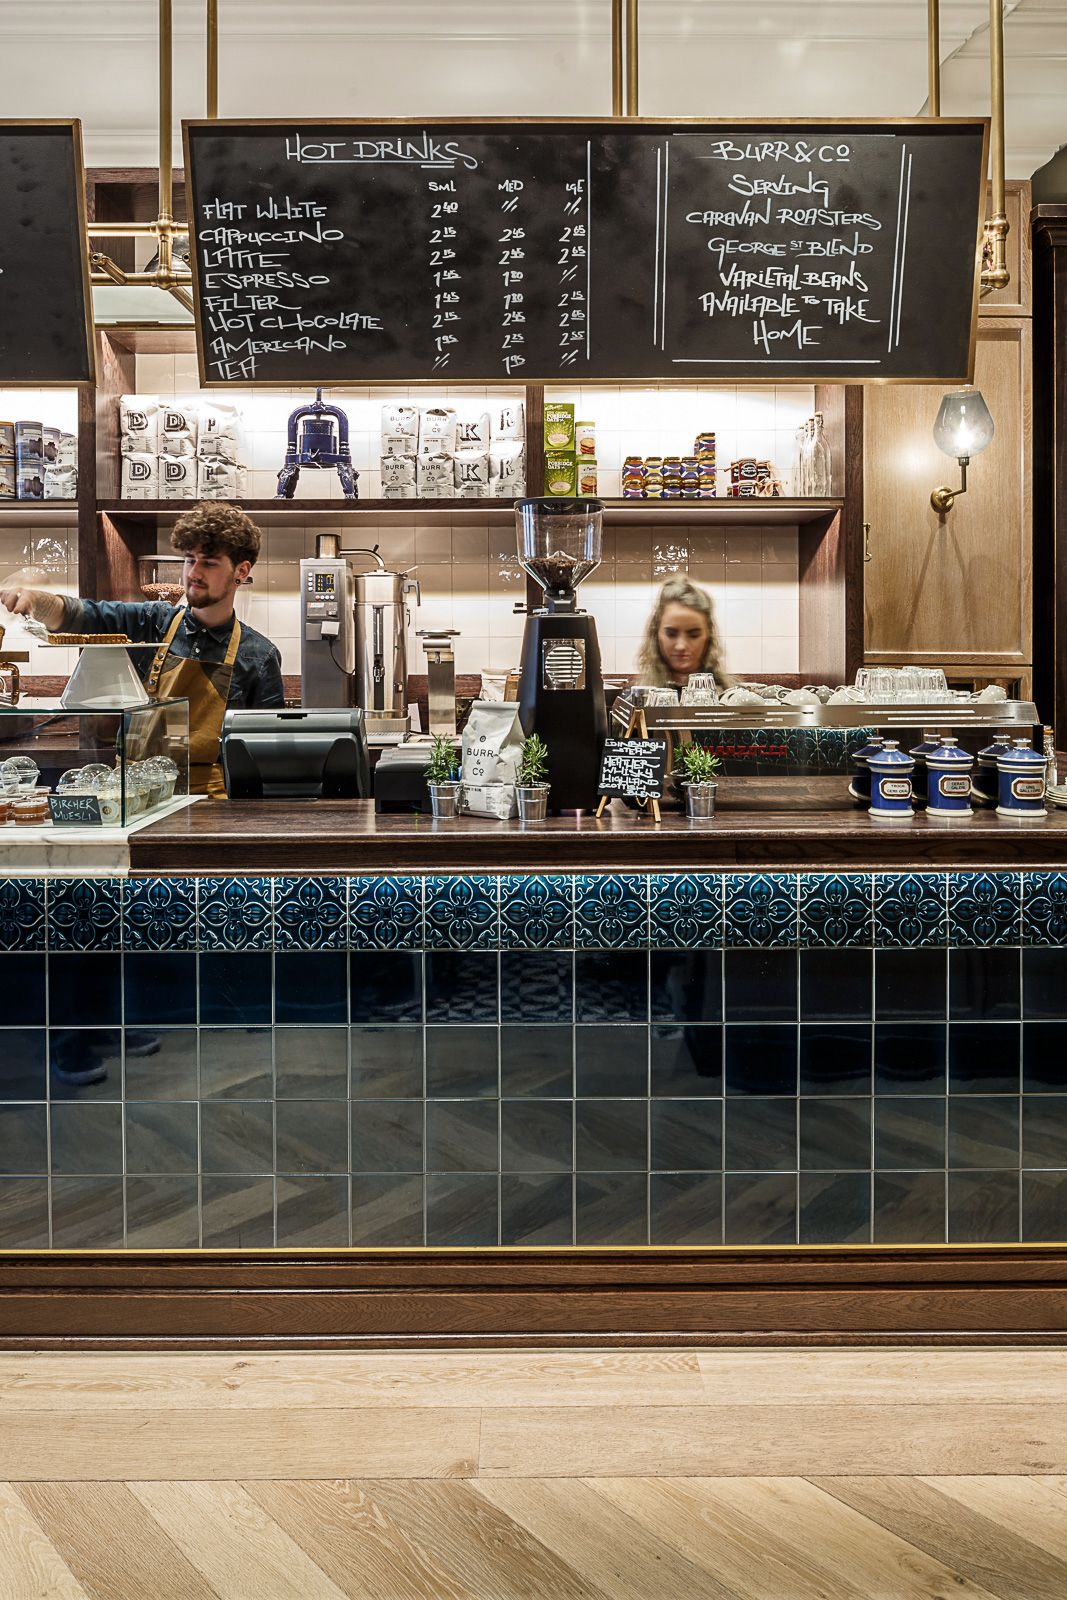 Burr co cafe edinburgh scotland beautiful green blue